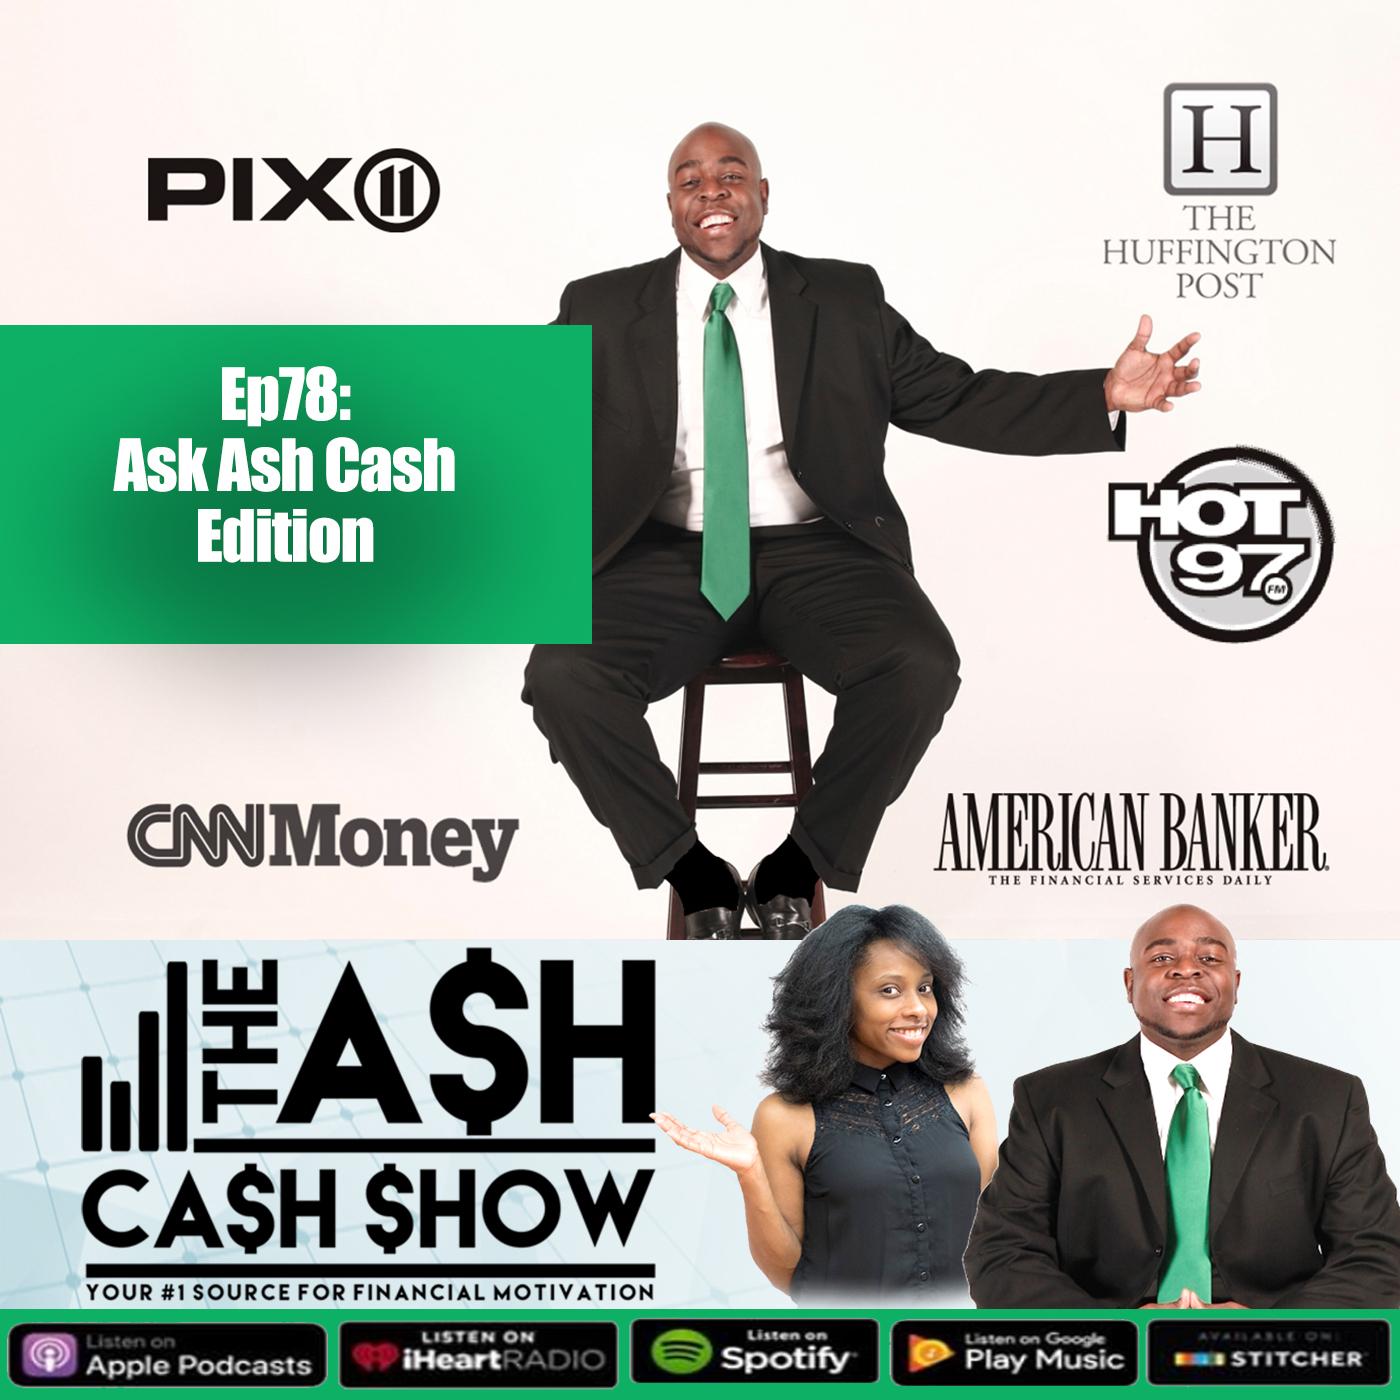 Artwork for Ep78 - Ask Ash Cash Edition